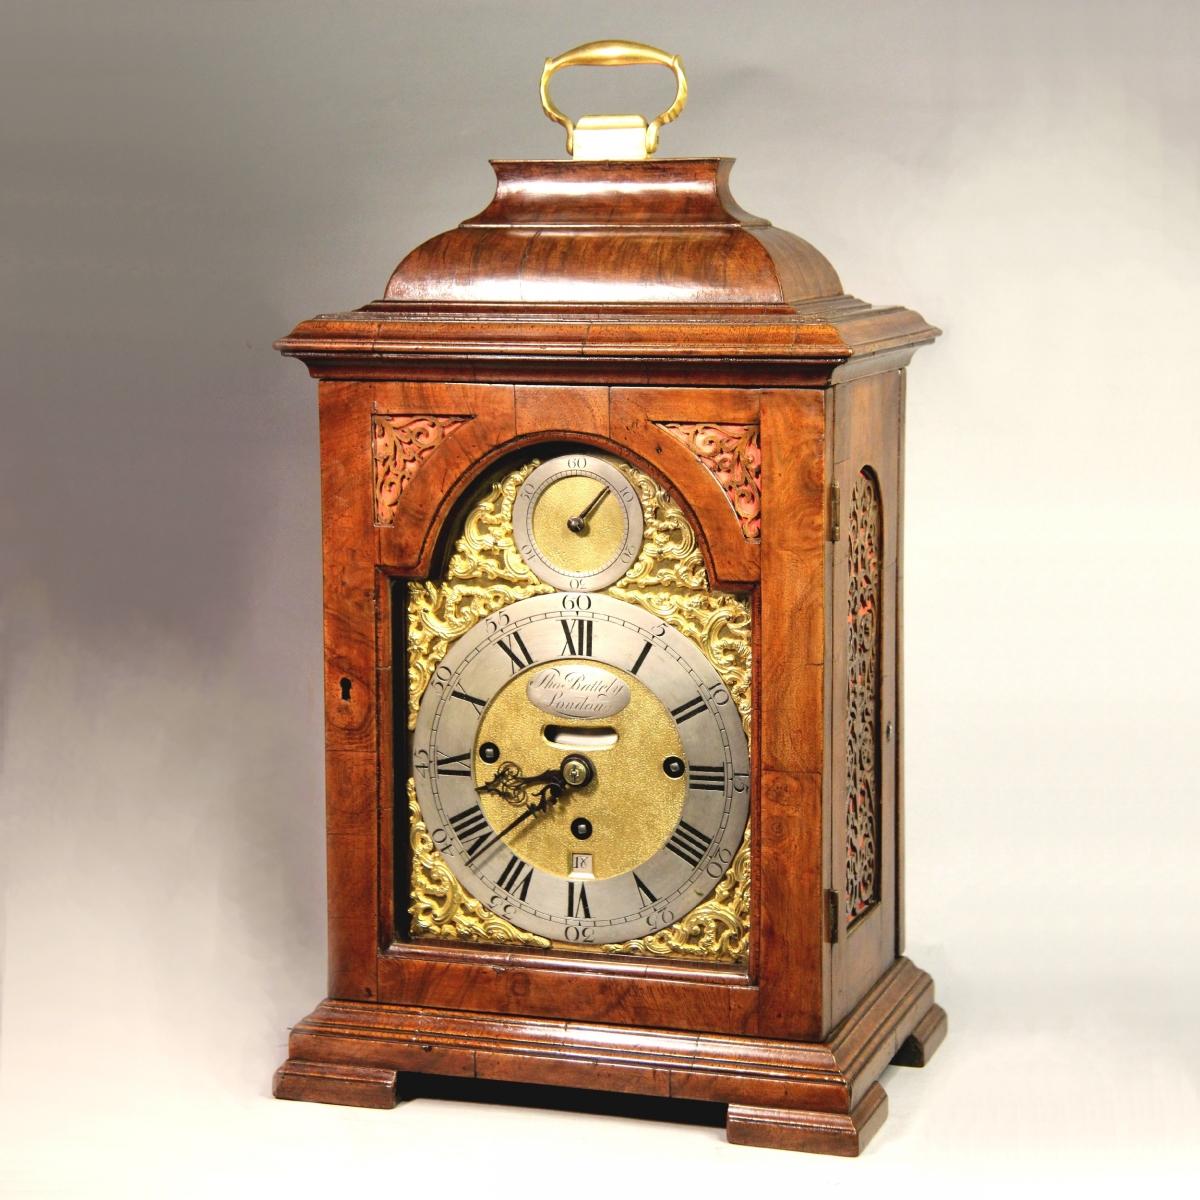 M C Taylor Small Walnut Verge Bracket Clock For Sale